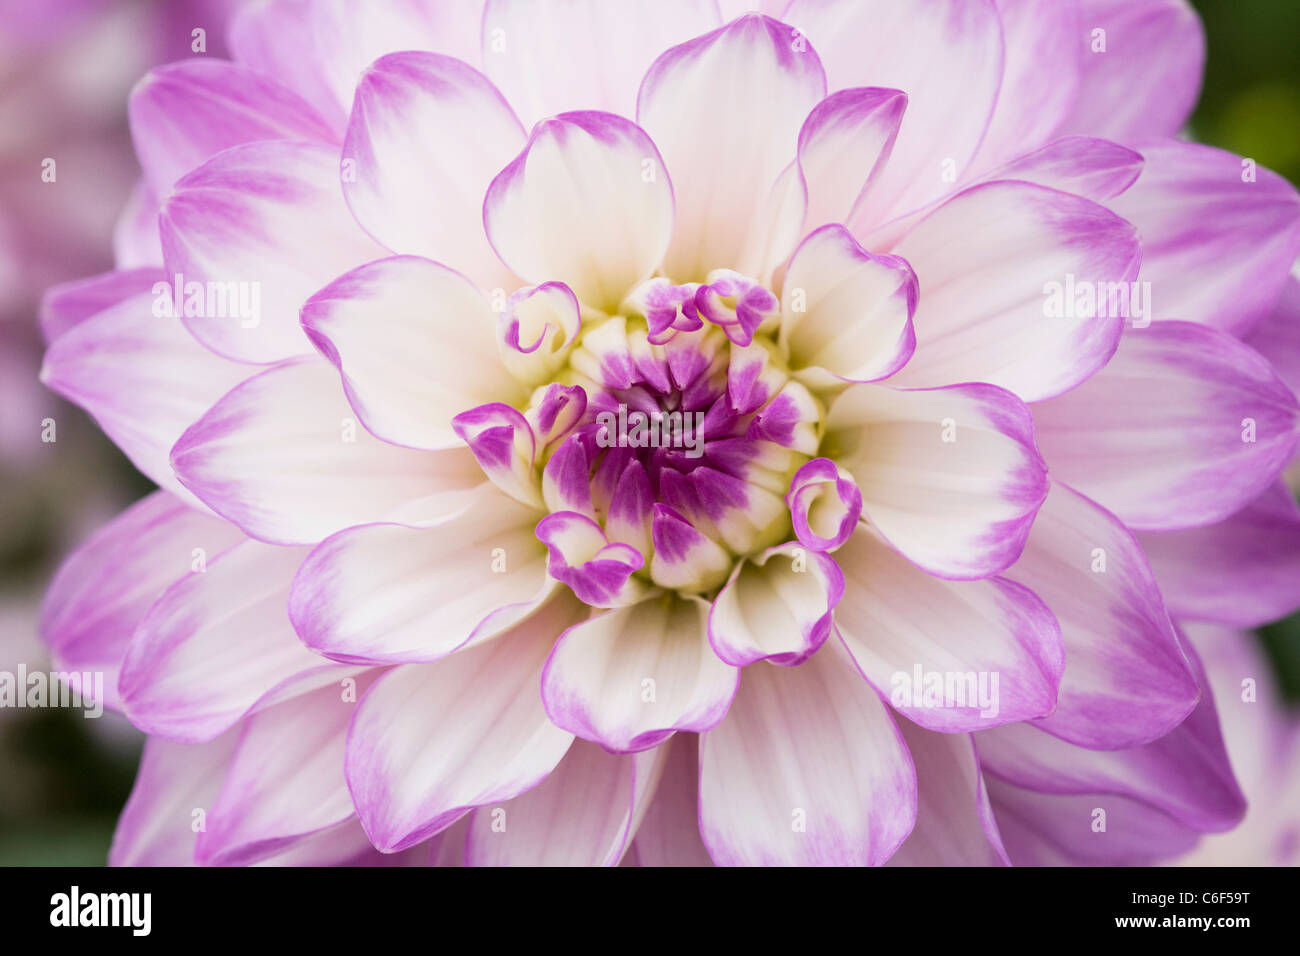 Dahlia 'Audacity'. Close up of flowerhead. - Stock Image